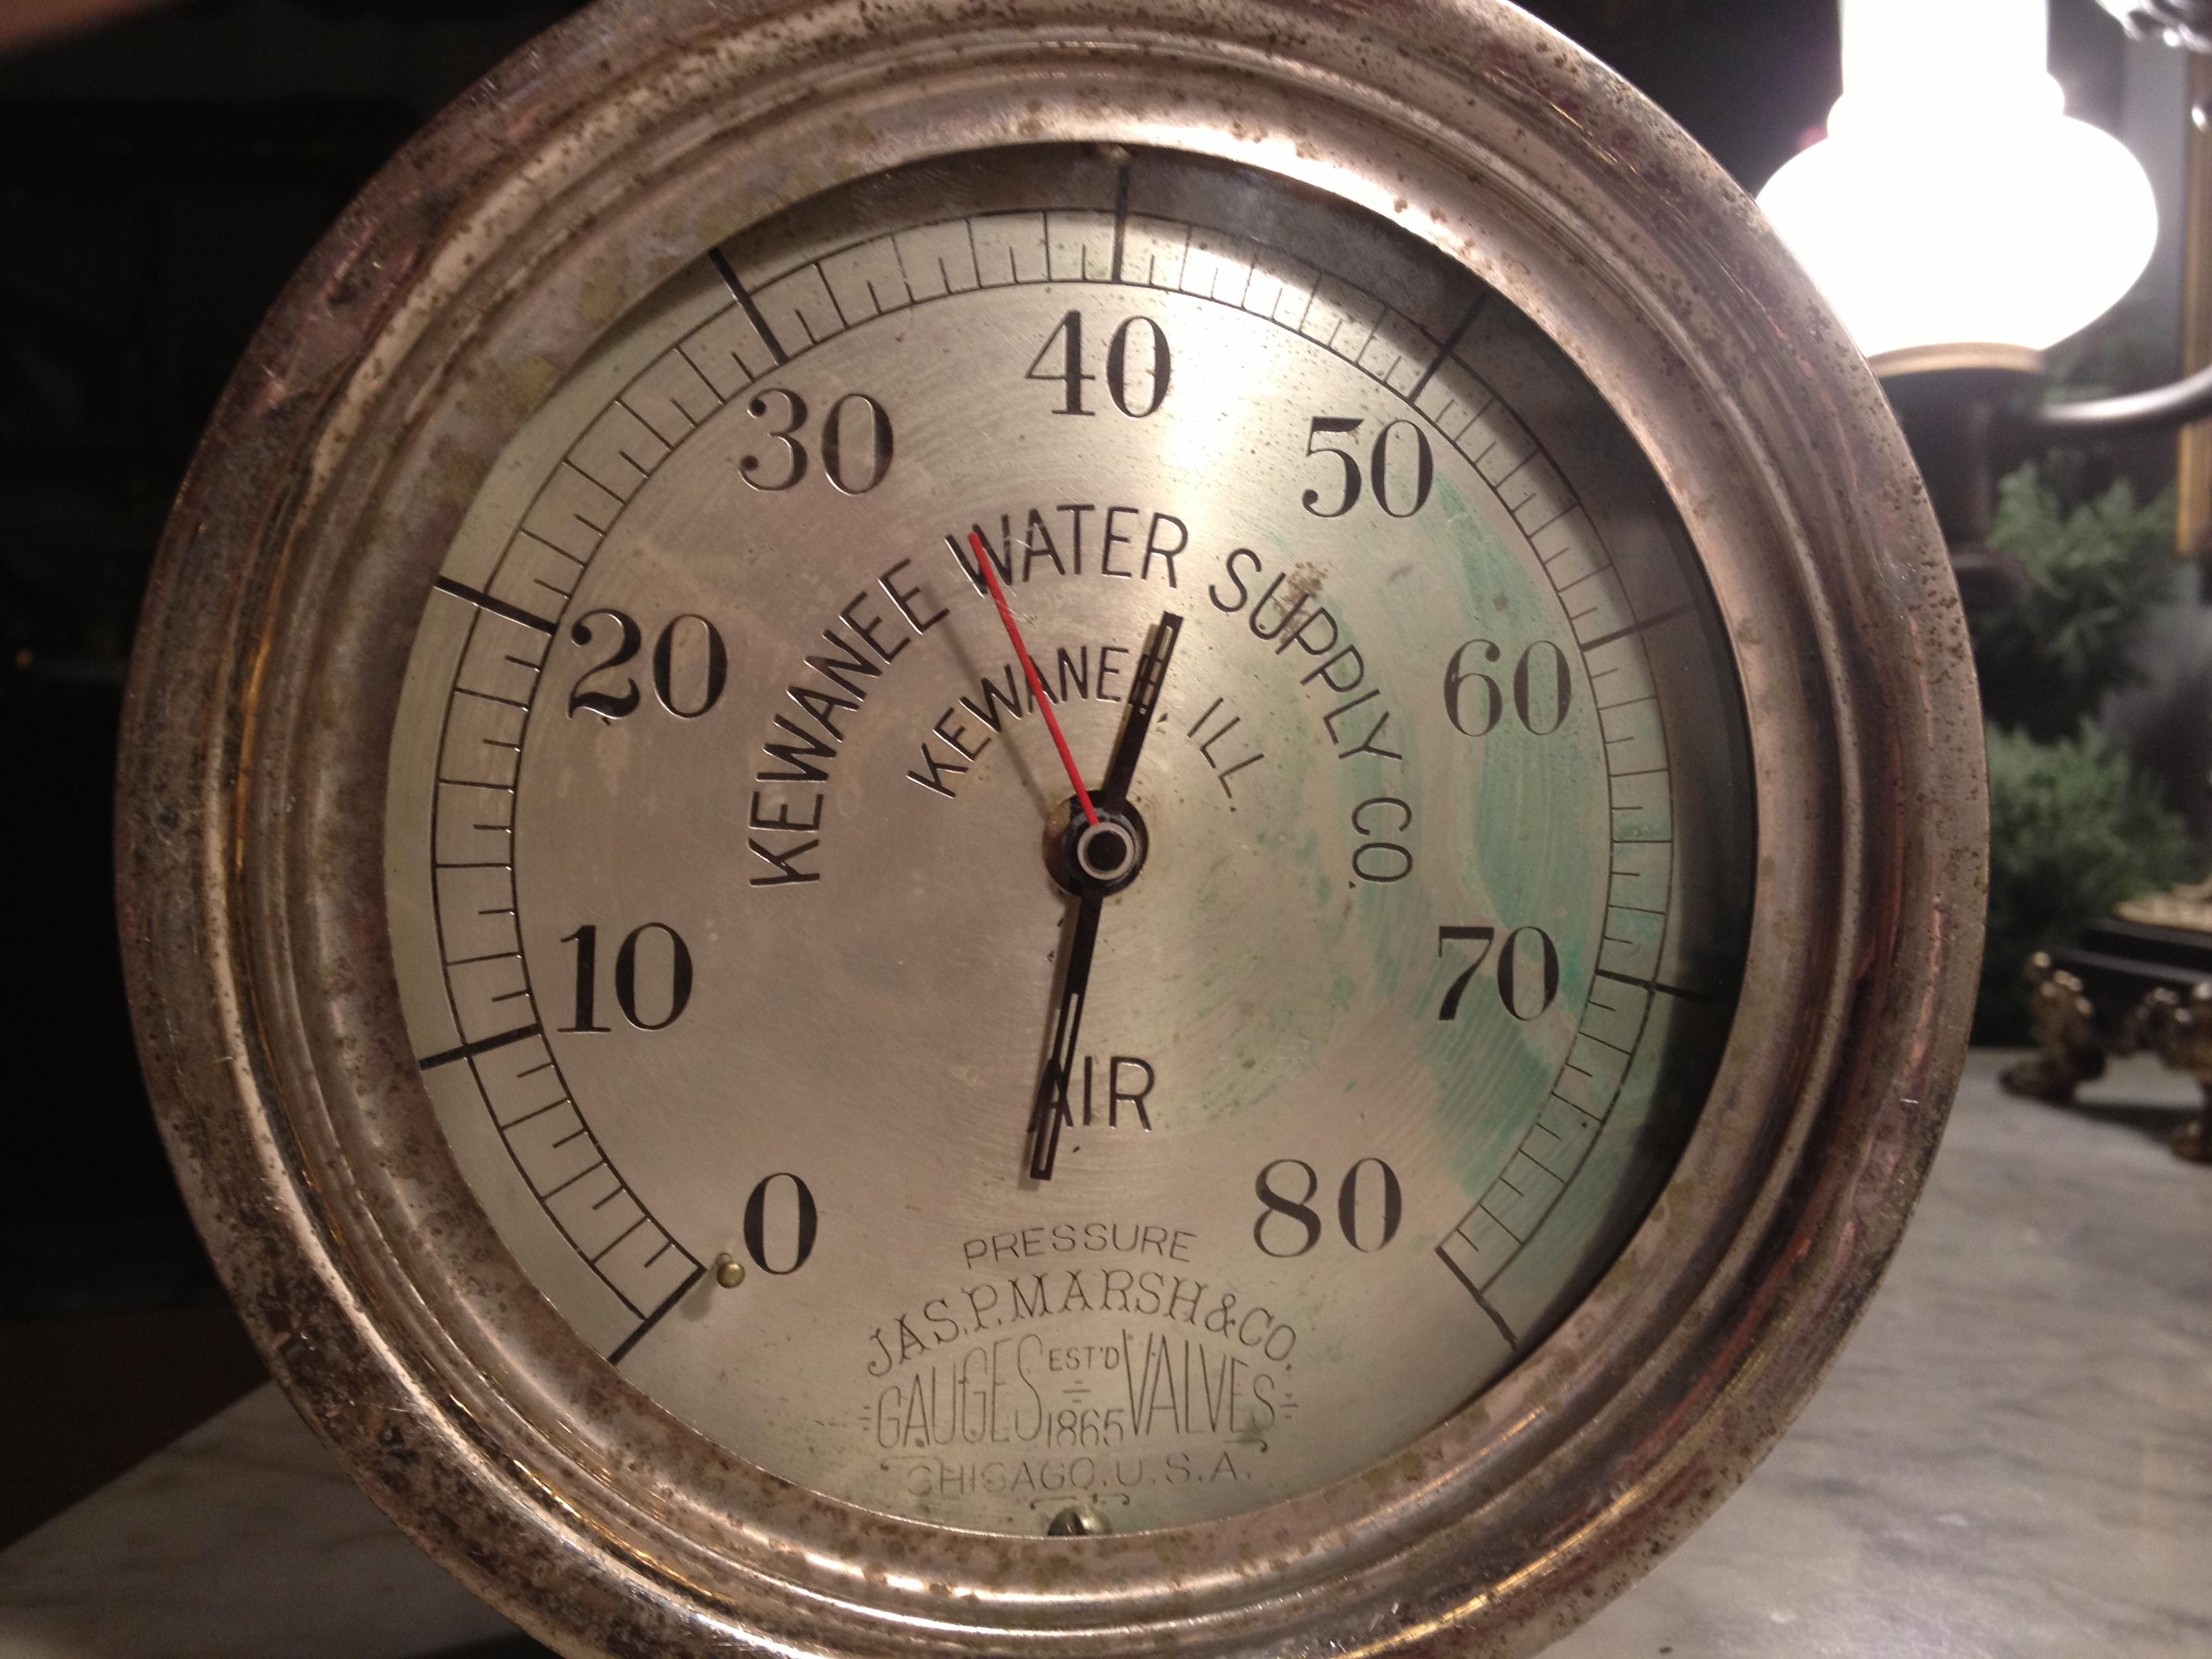 i_gearz_steampunk_hand_made_steam_pressure_gauge_clock_6_battery_op_antique_vintage_clocks_3.JPG